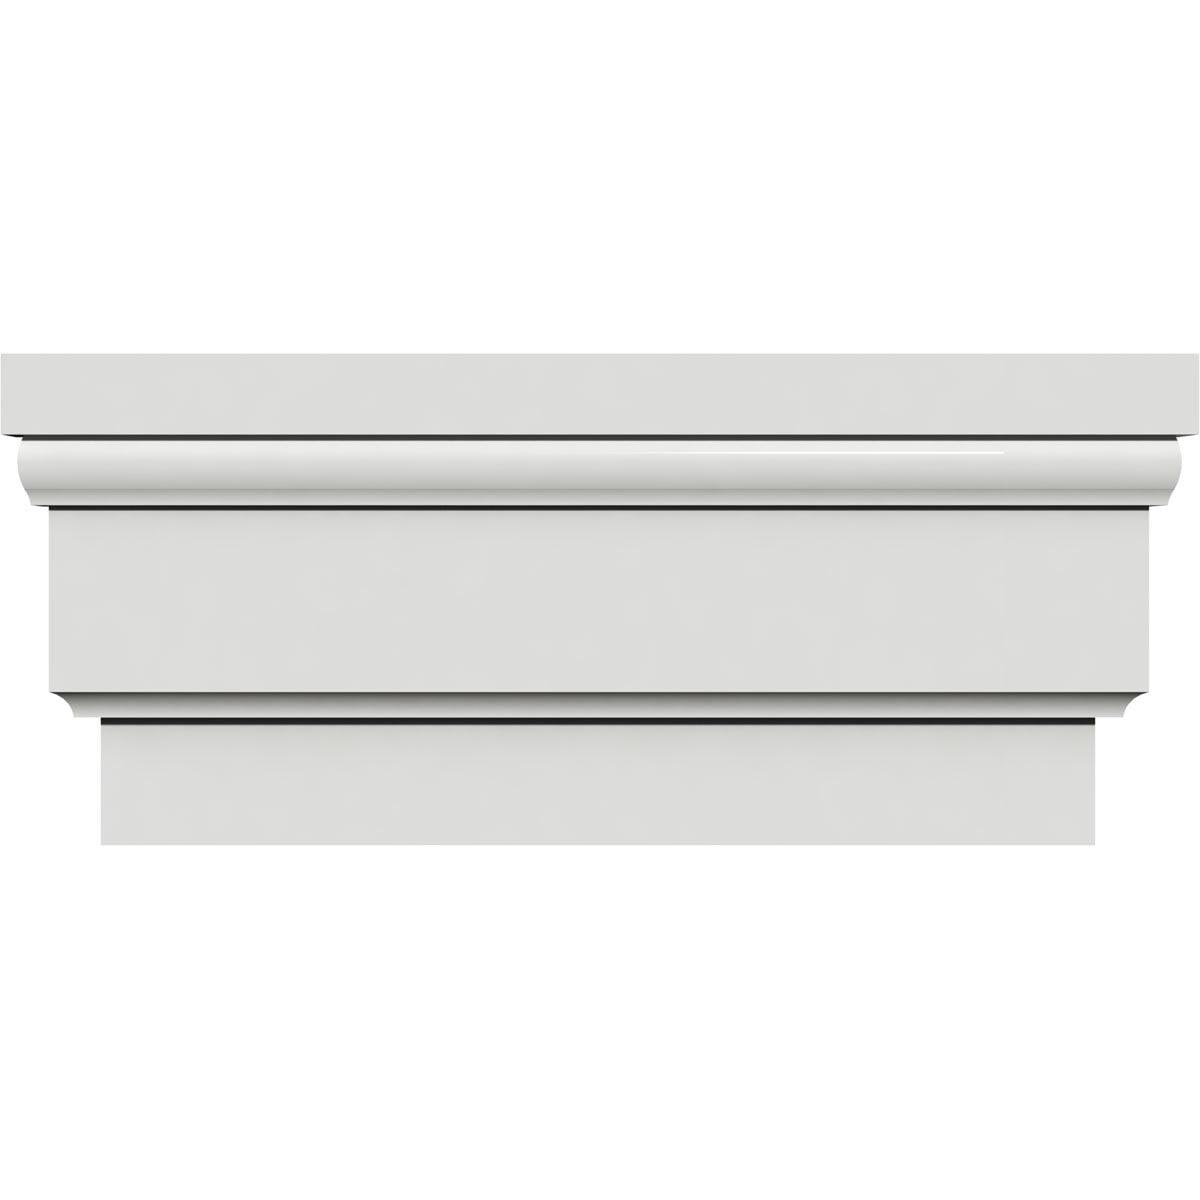 "Ekena Millwork - Standard Crosshead  12 7/8""H x 1 1/4""P 150643851"